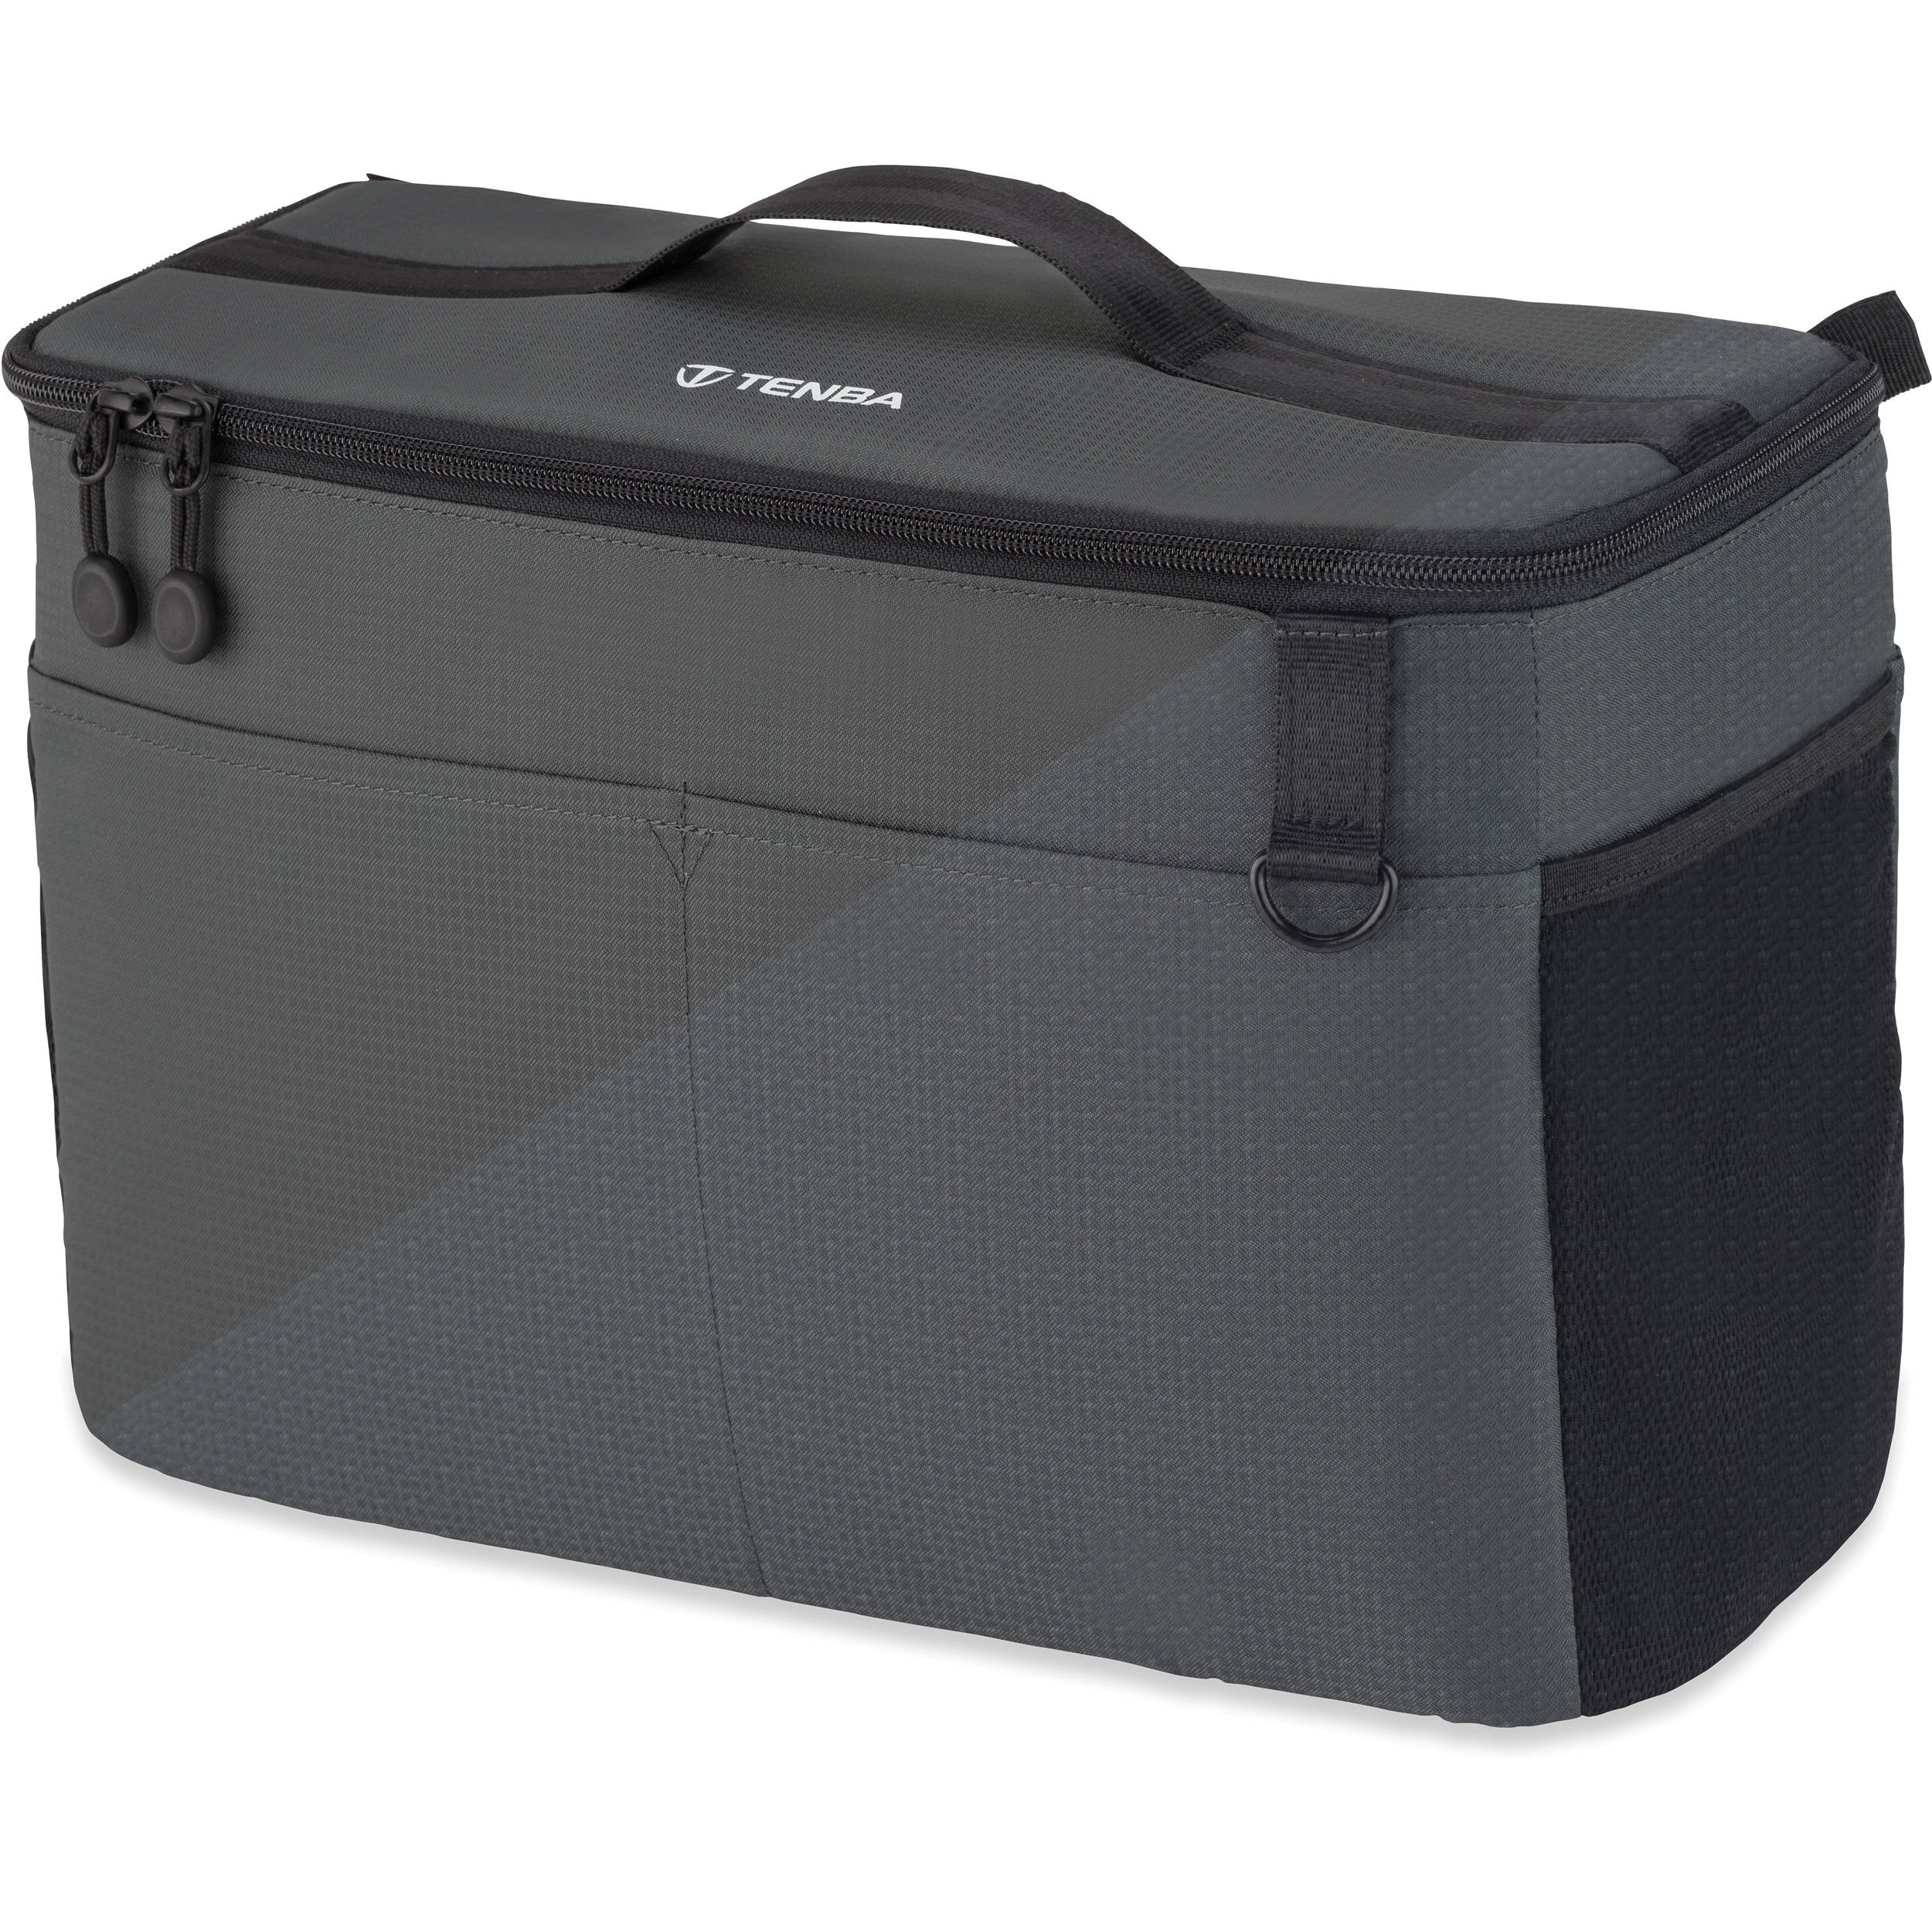 Case Inserts Amp Compartments Bamph Photo Video The 6 In 1 Secret Pouch Bag Organiser Bgo 15 Tenba Byob 13 Camera Insert Gray